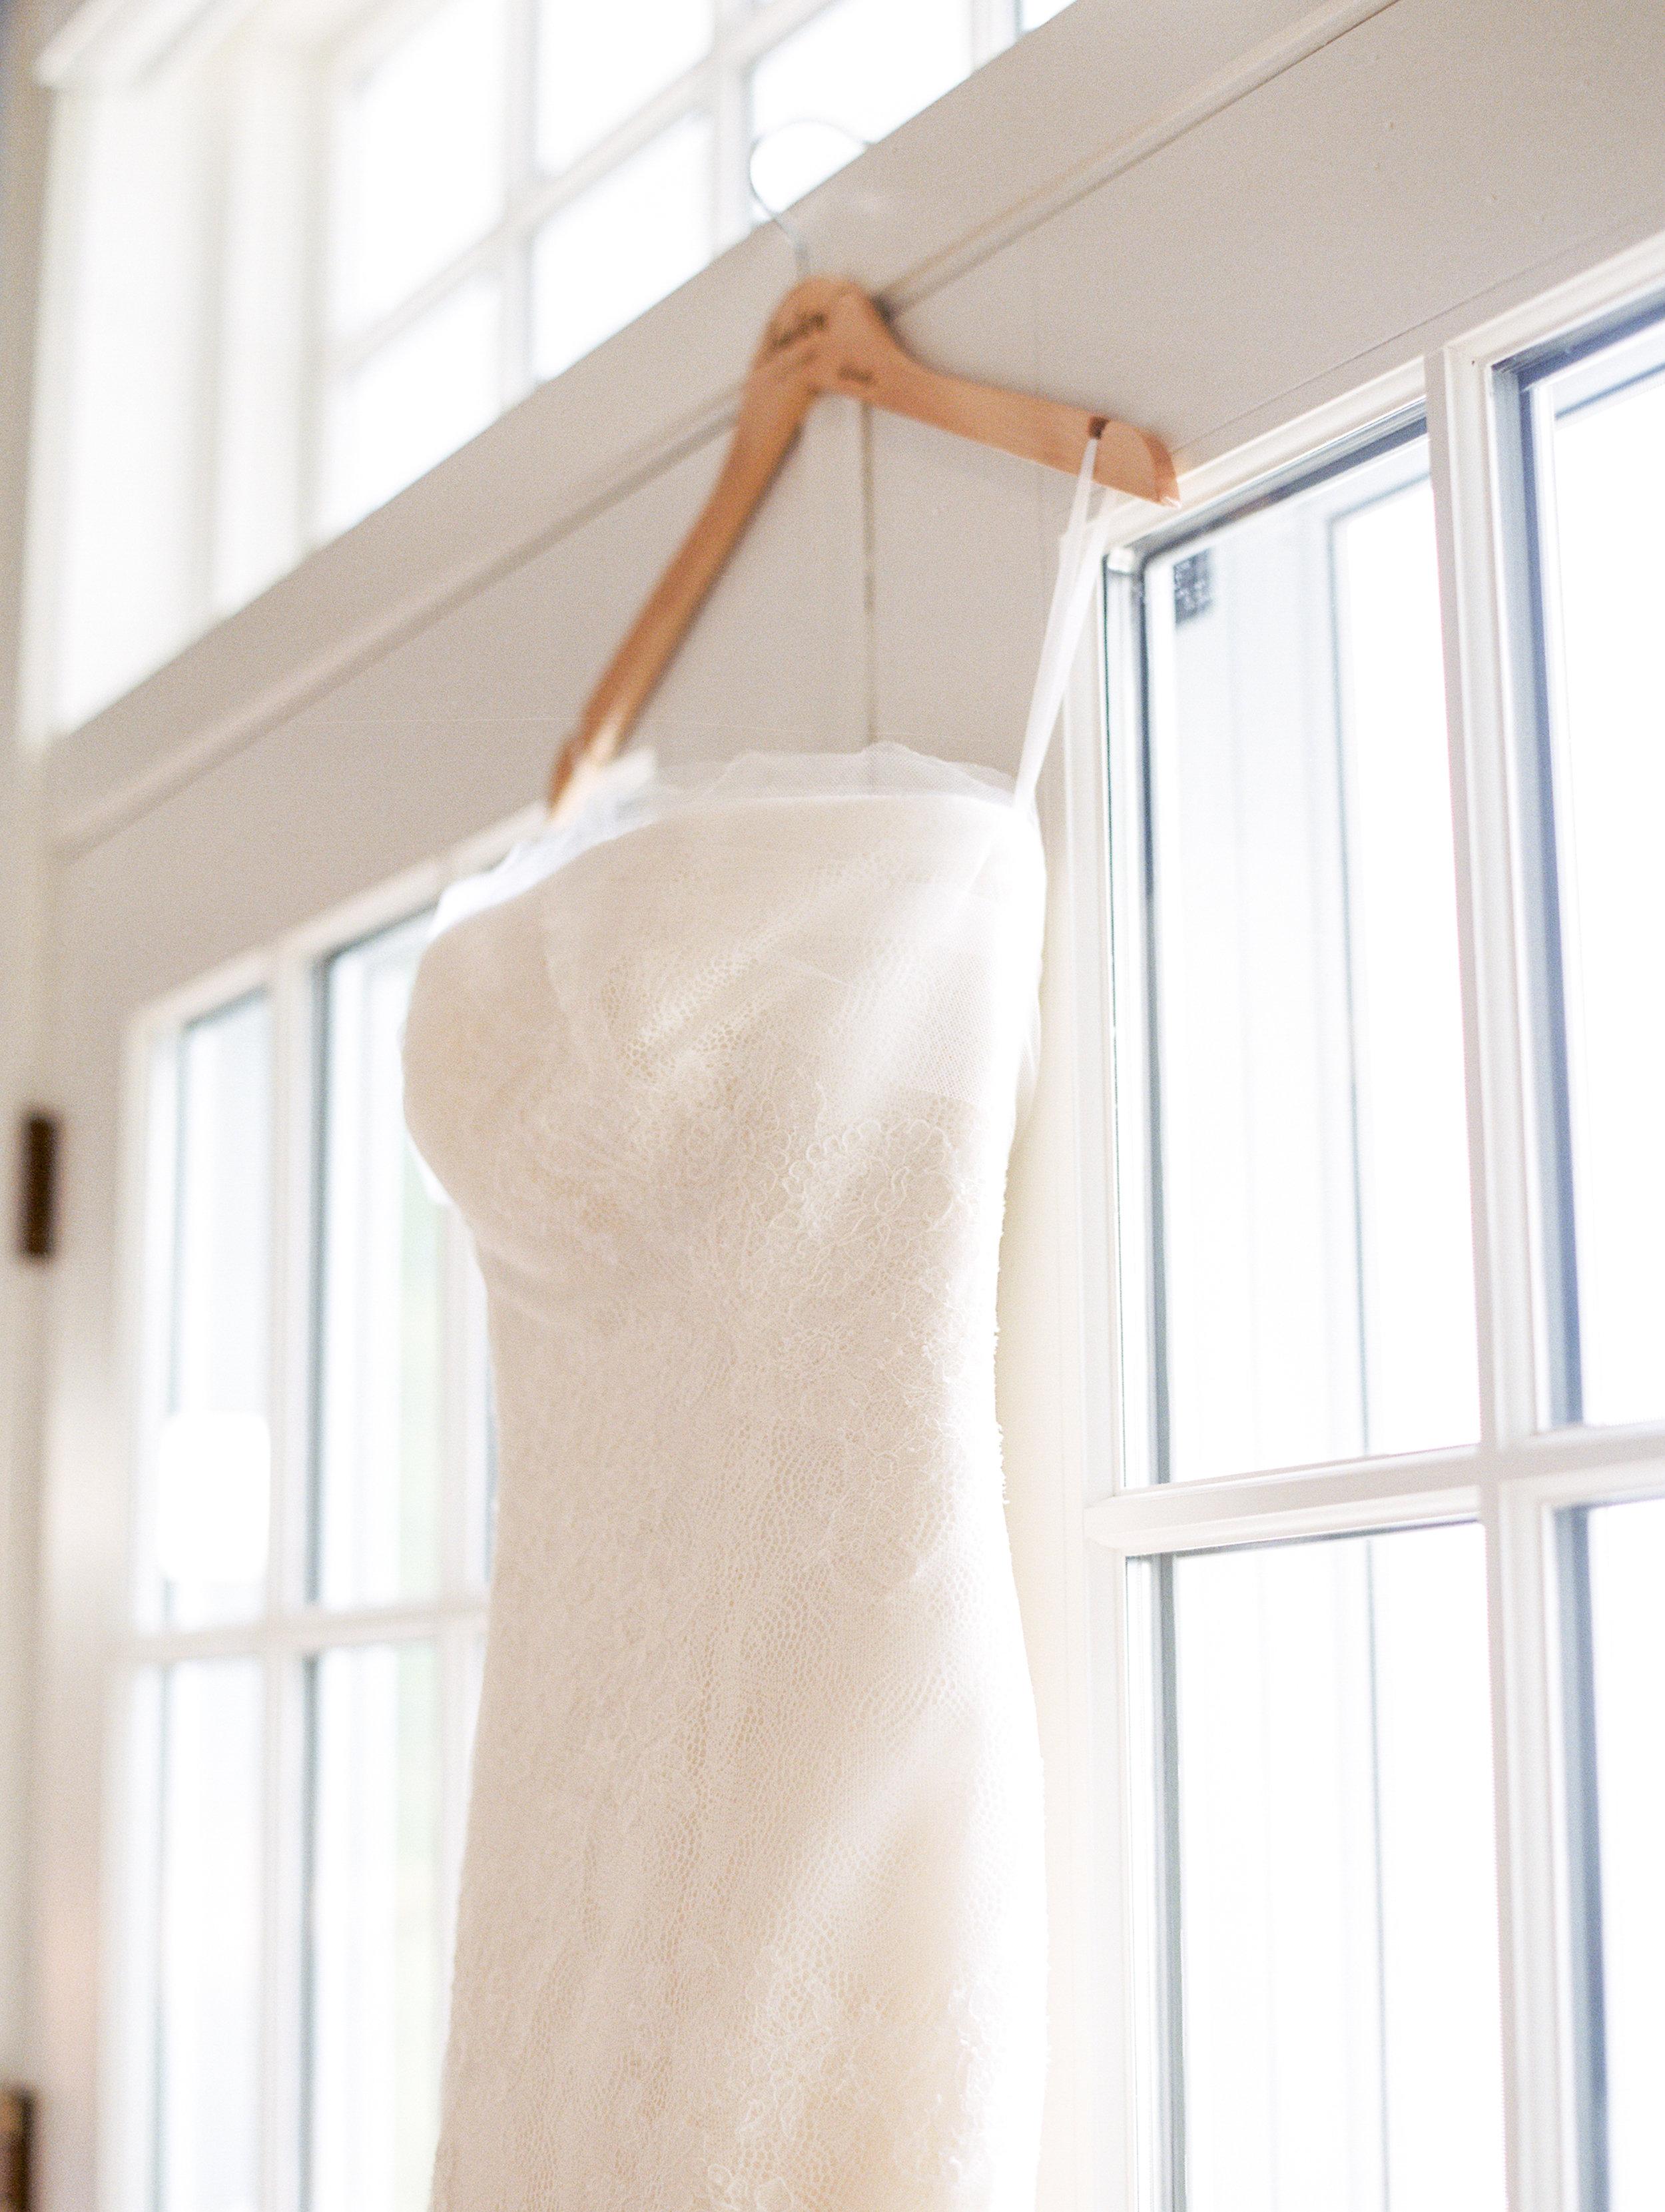 Coffman+Wedding+Details-74.jpg